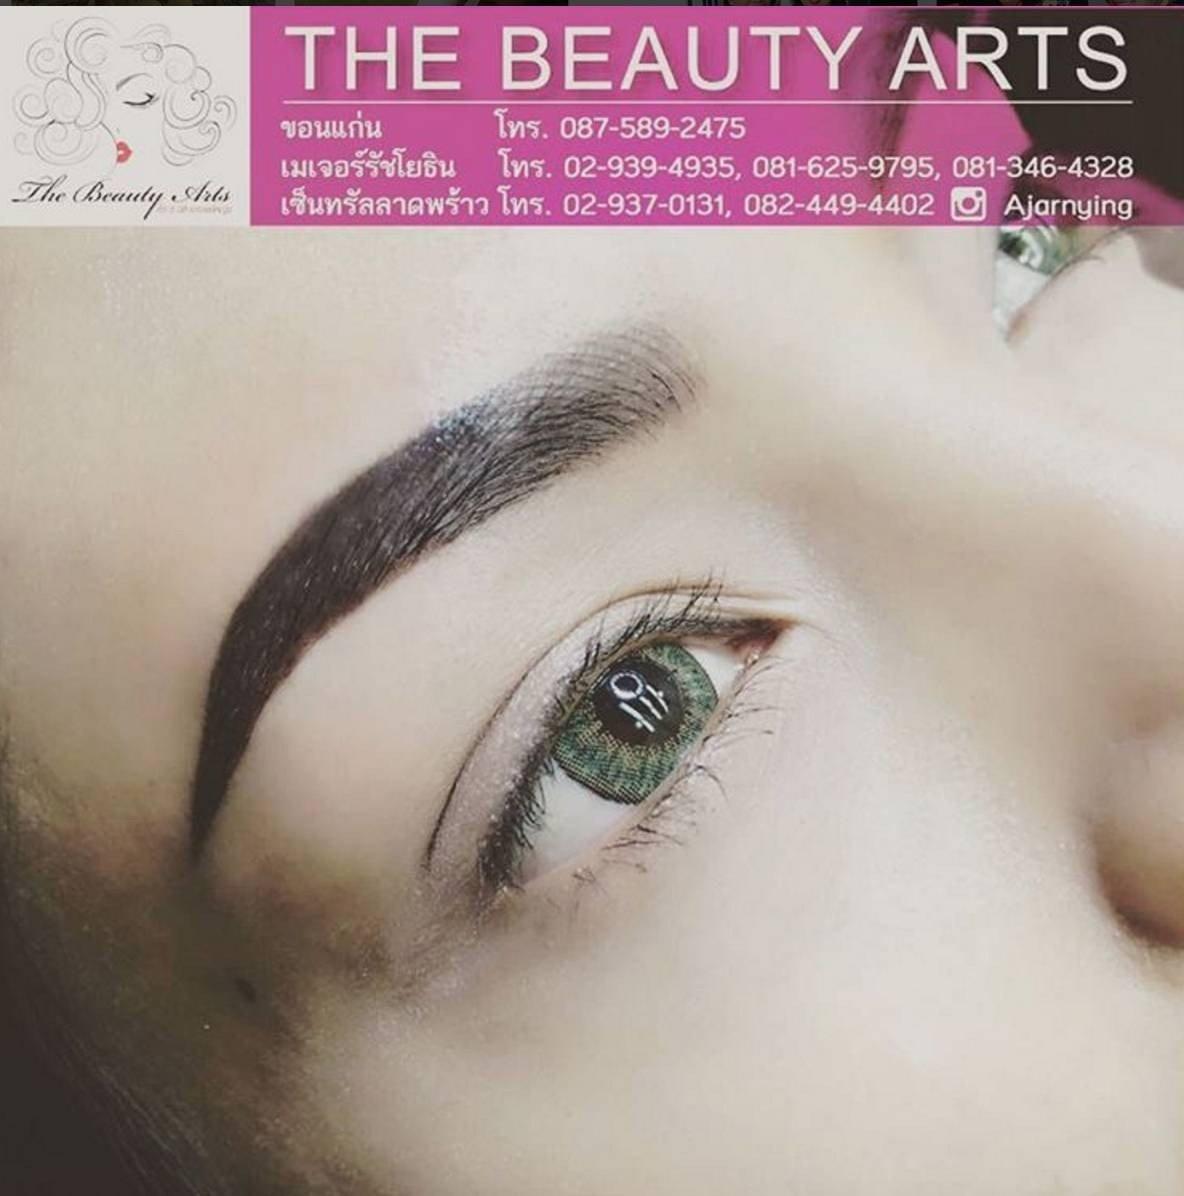 The Beauty Arts เซ็นทรัลลาดพร้าว